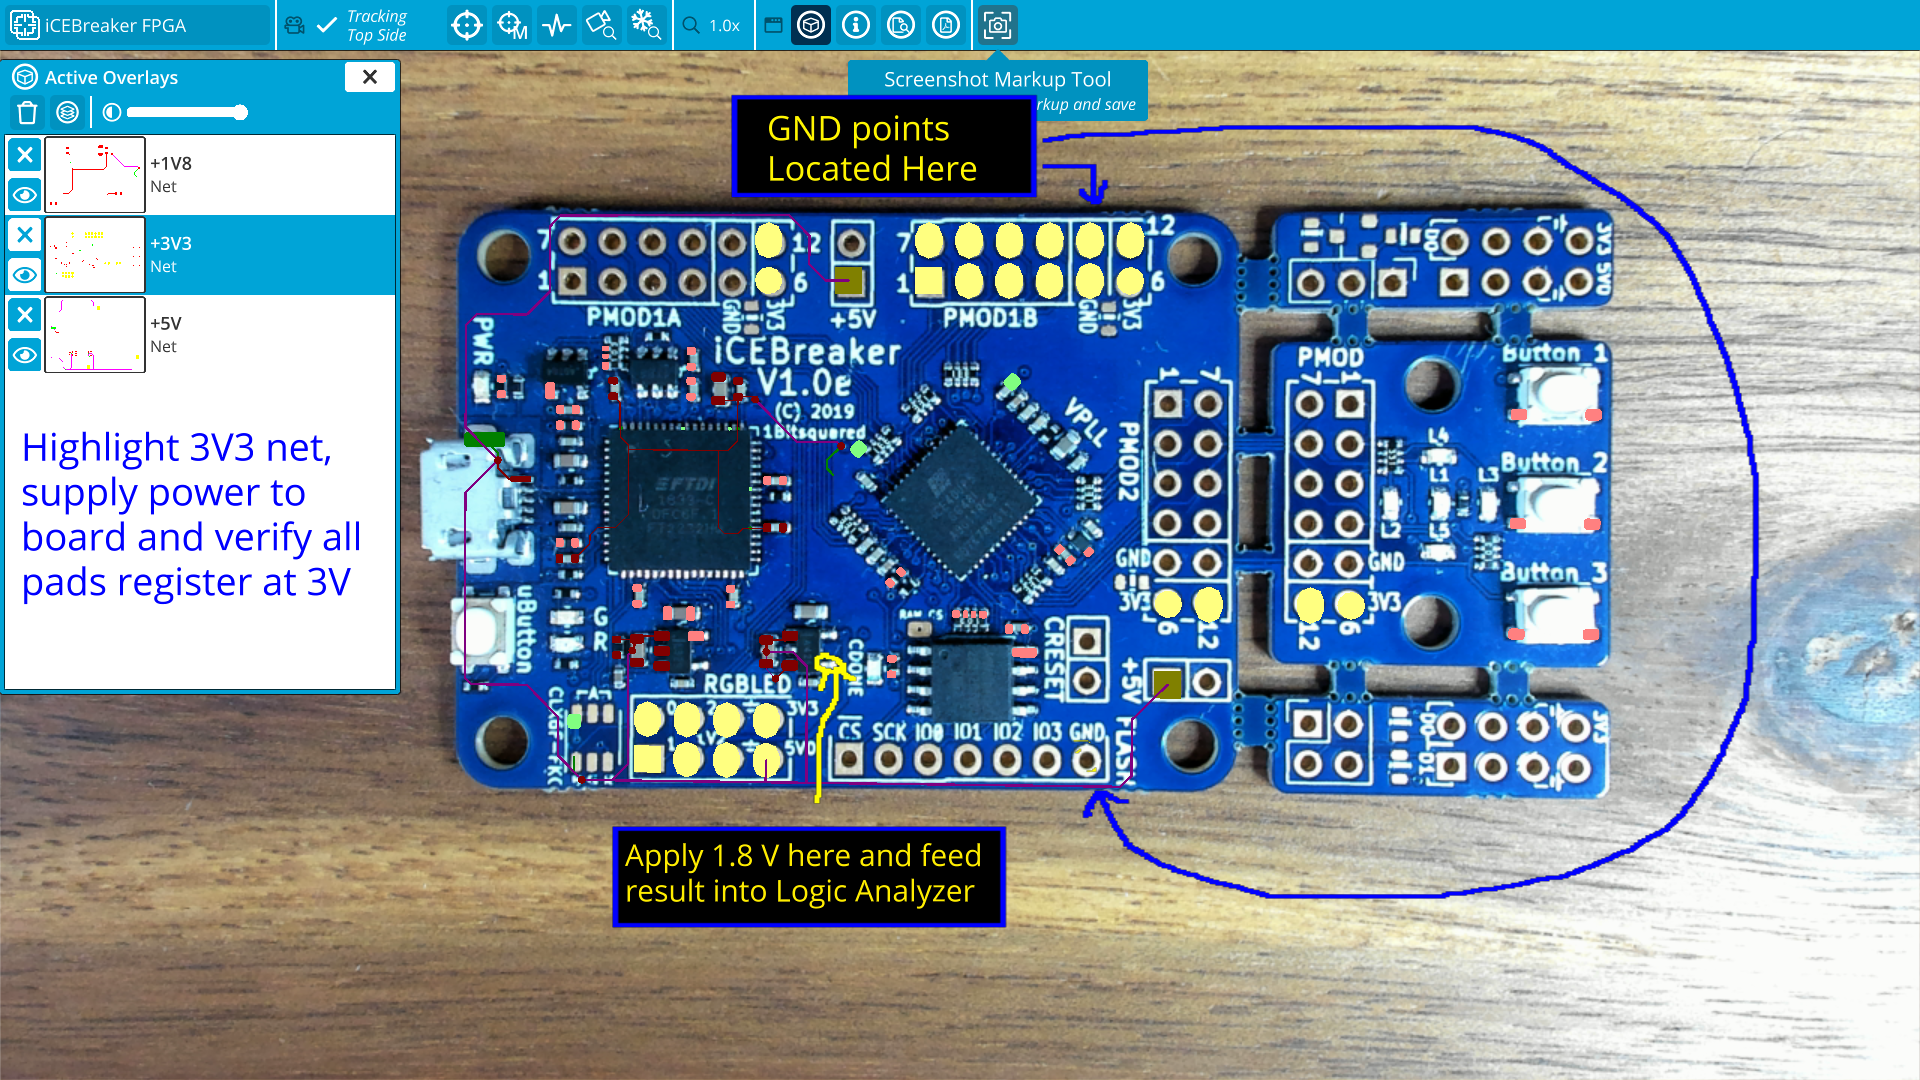 Screenshot Markup Tool inspectAR communicate collaborate